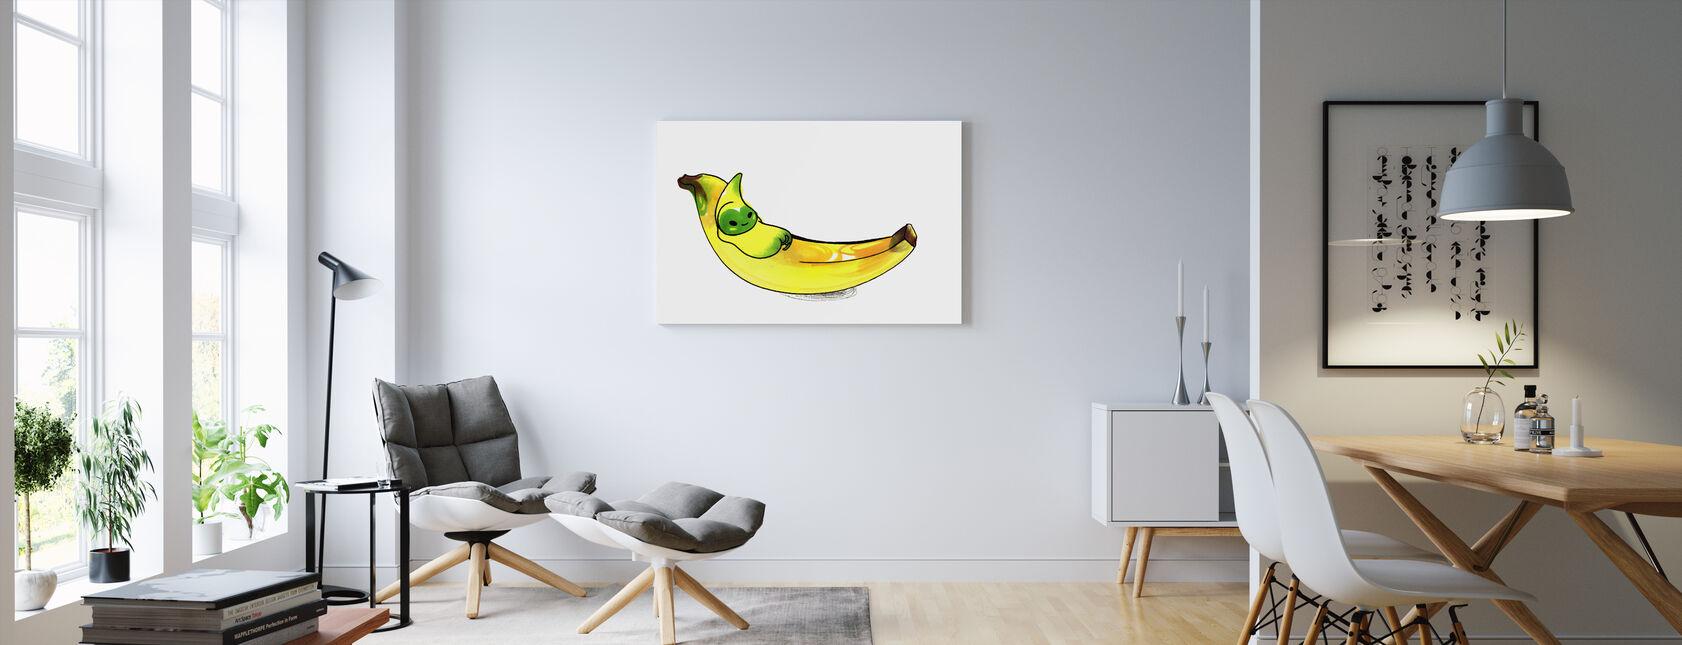 Banan - Canvastavla - Vardagsrum